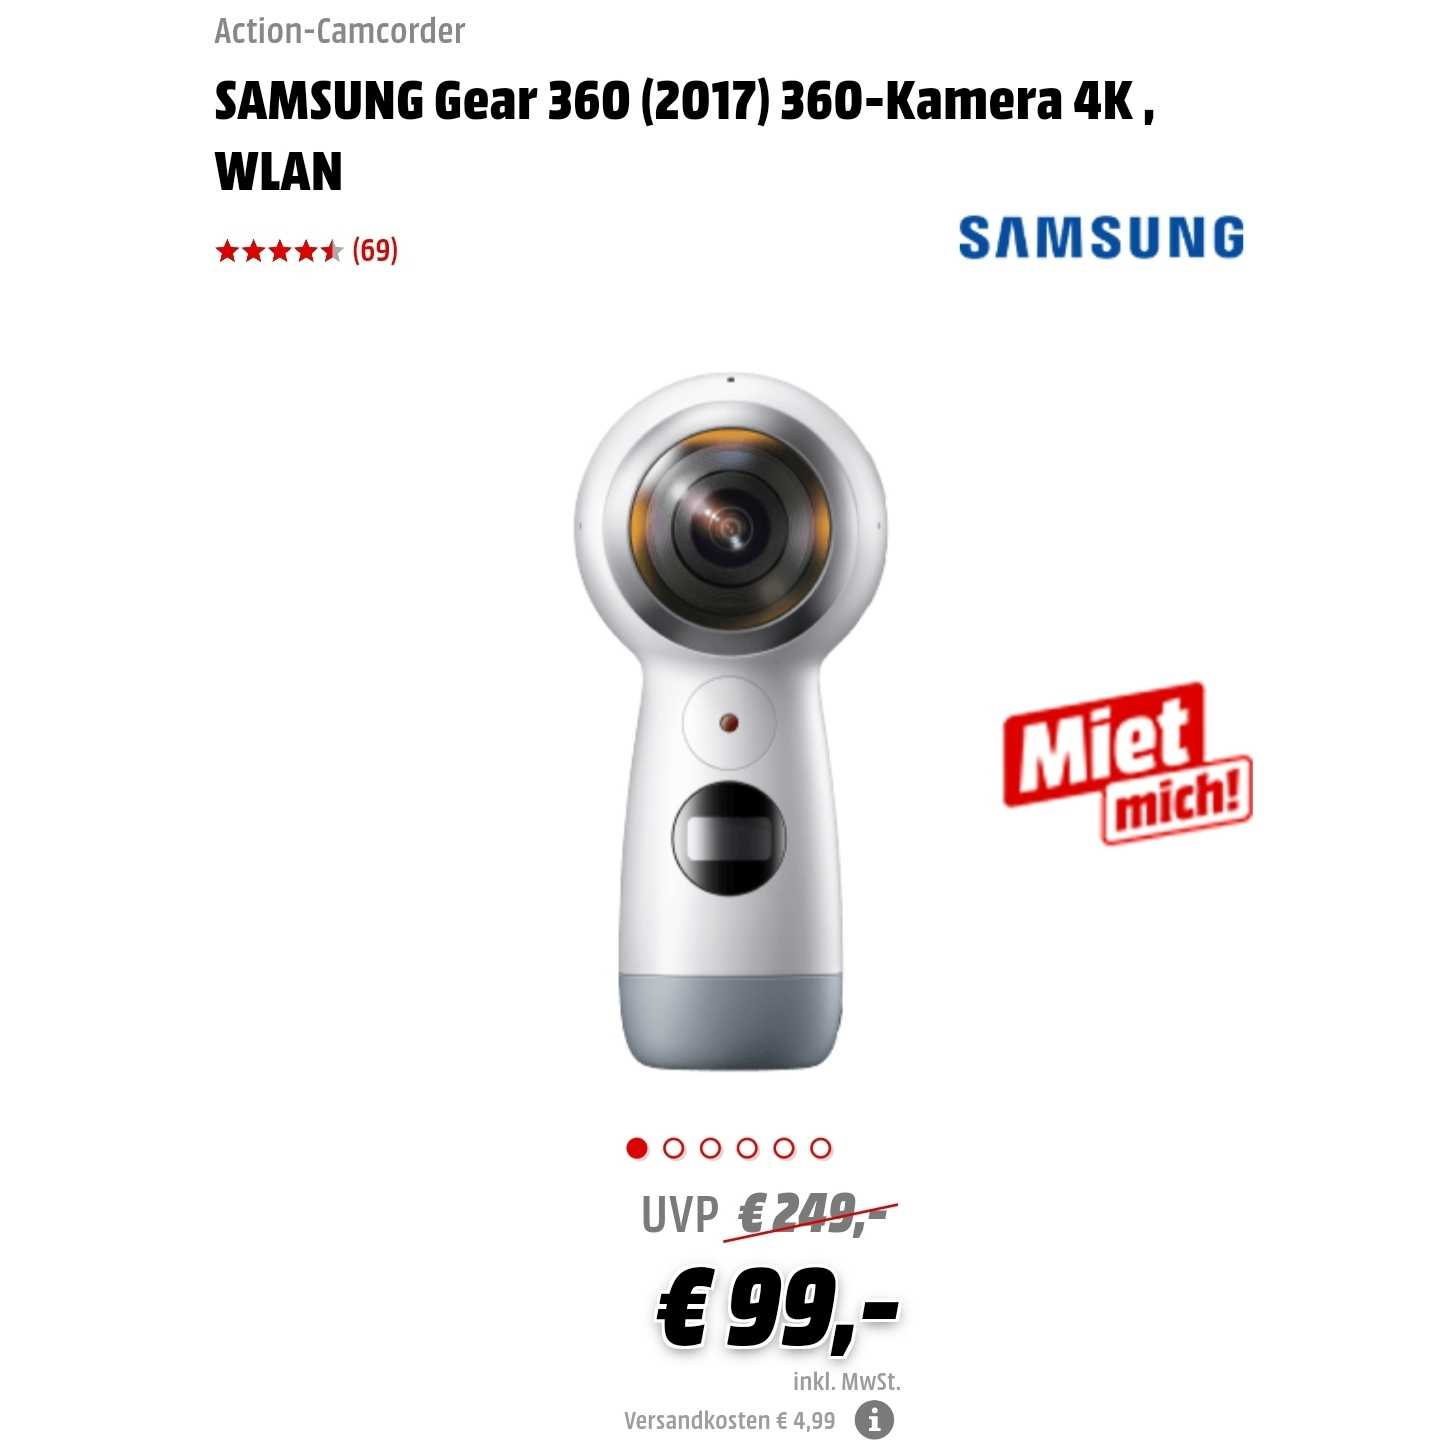 Samsung Gear 360 2017 360 Kamera 4k Für 99 499 Vsk Oder